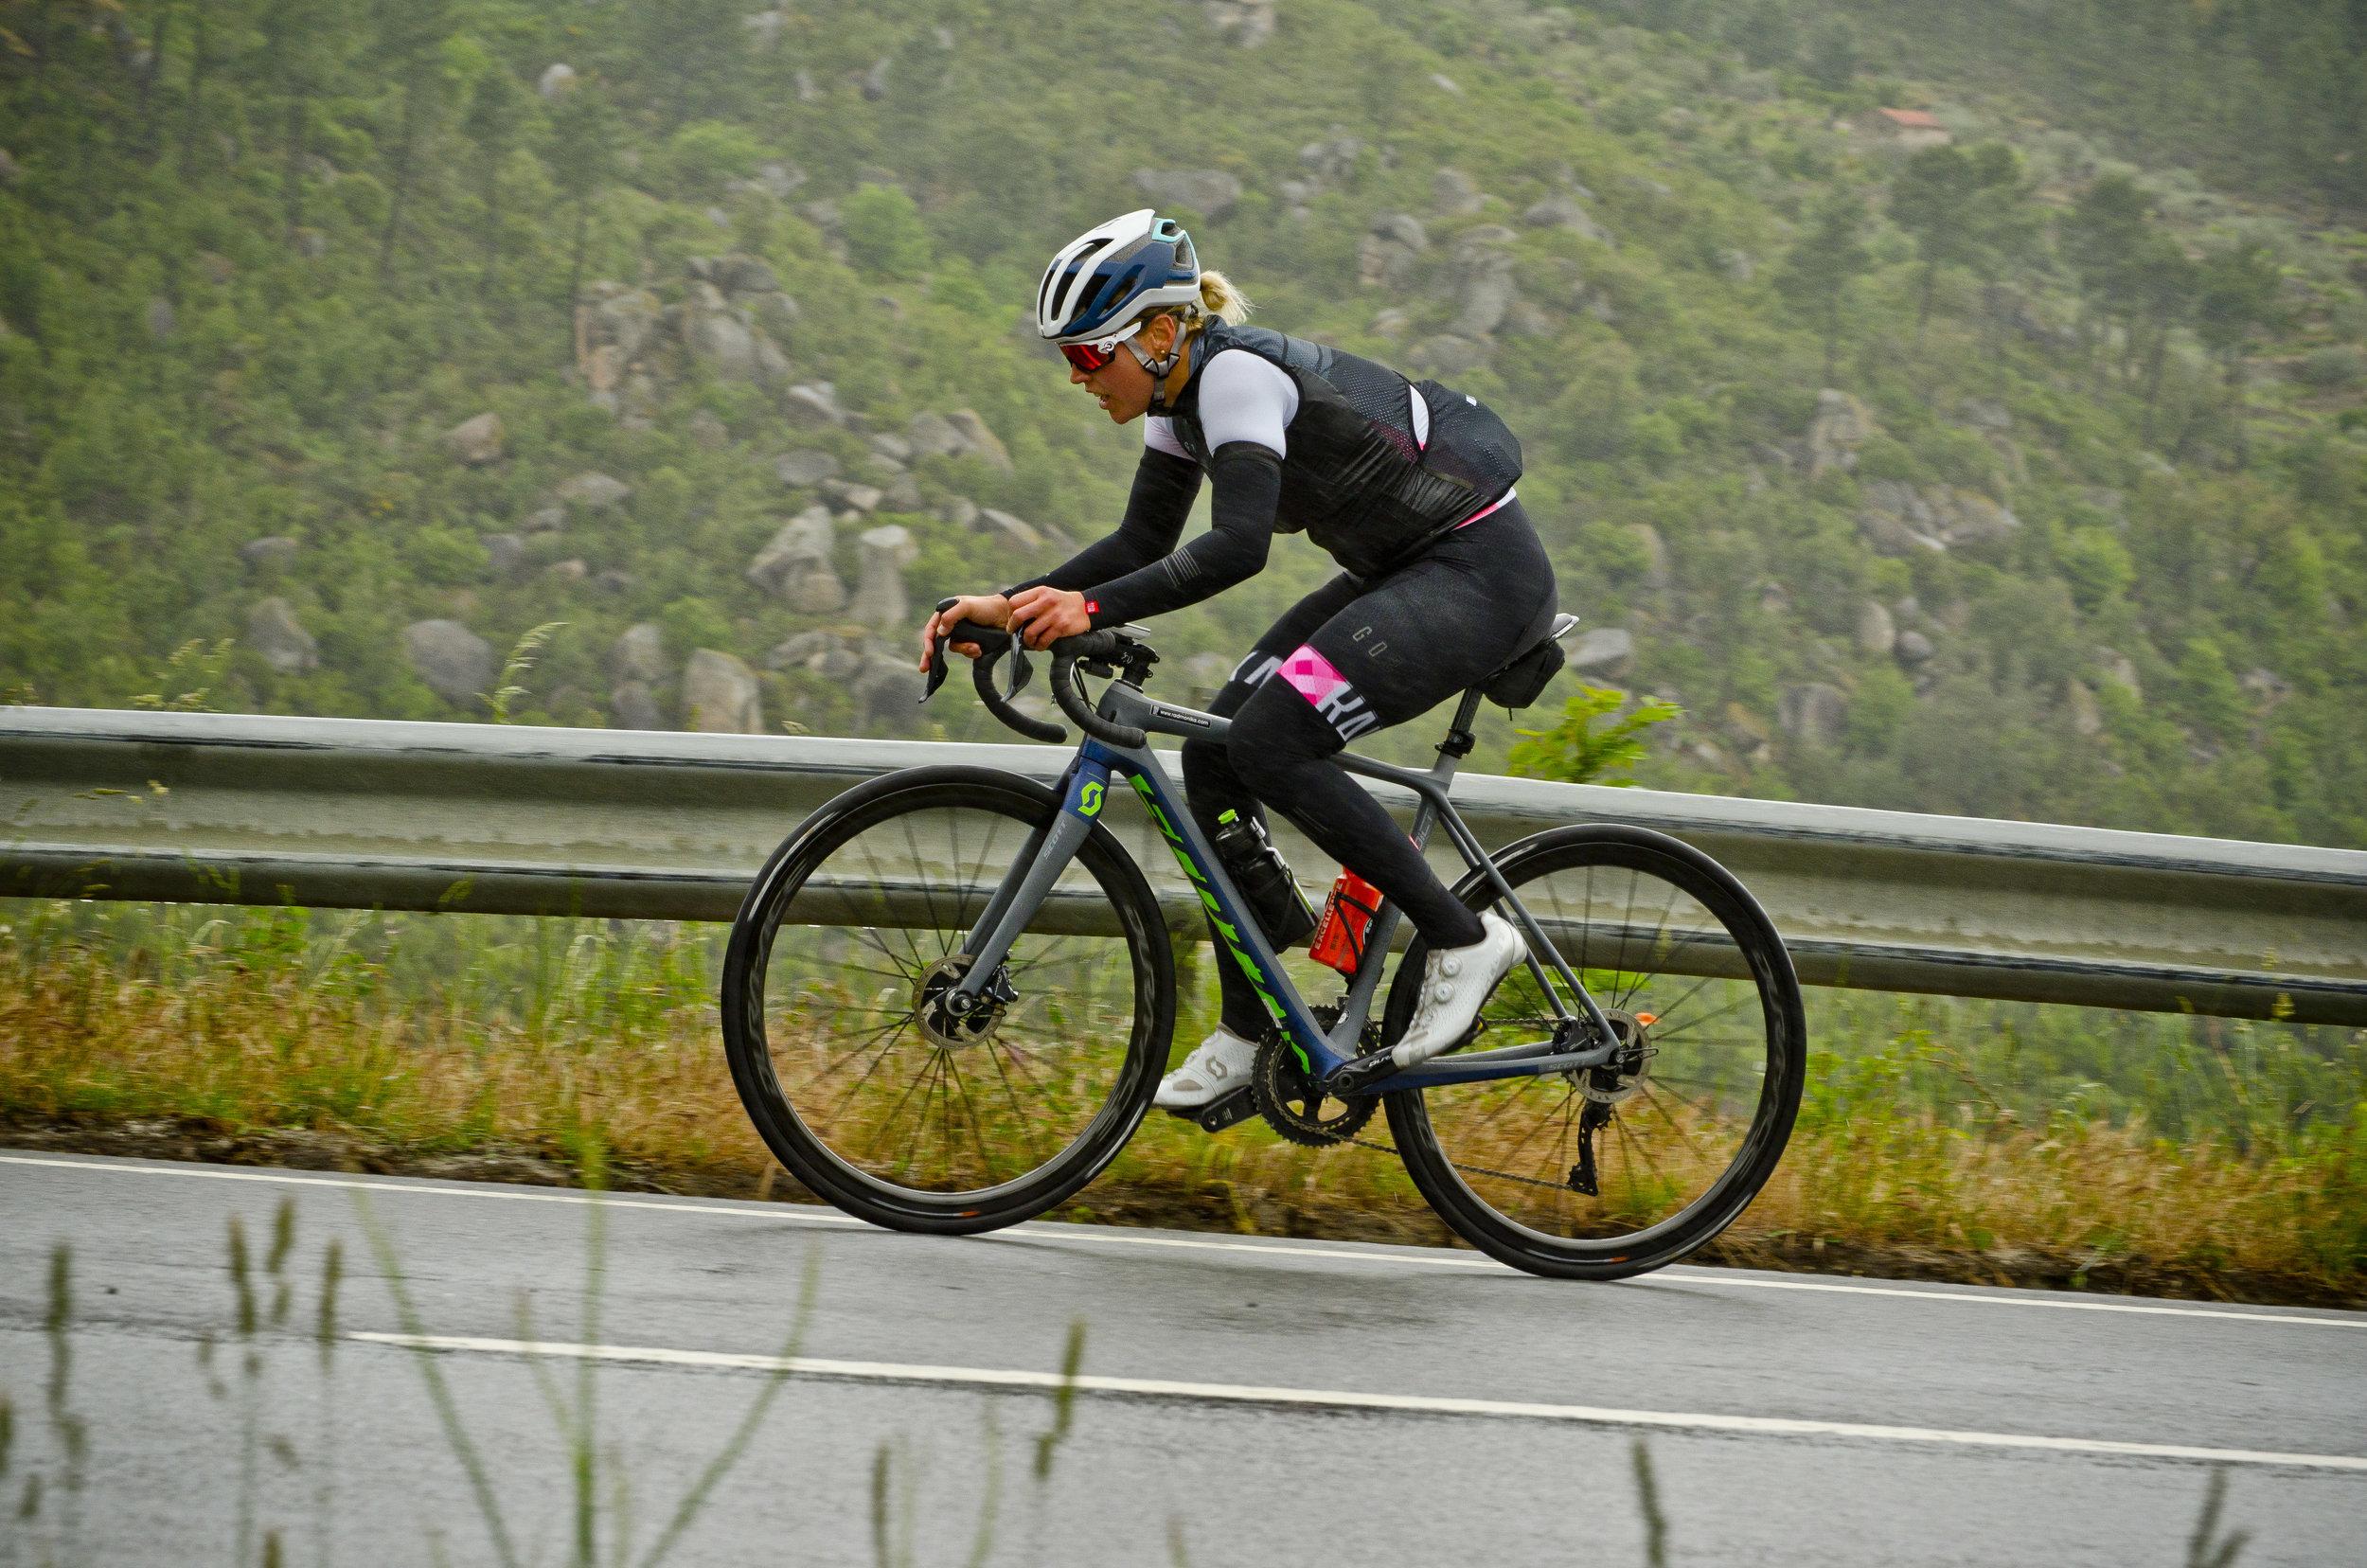 casquette womens cycling monika.jpg